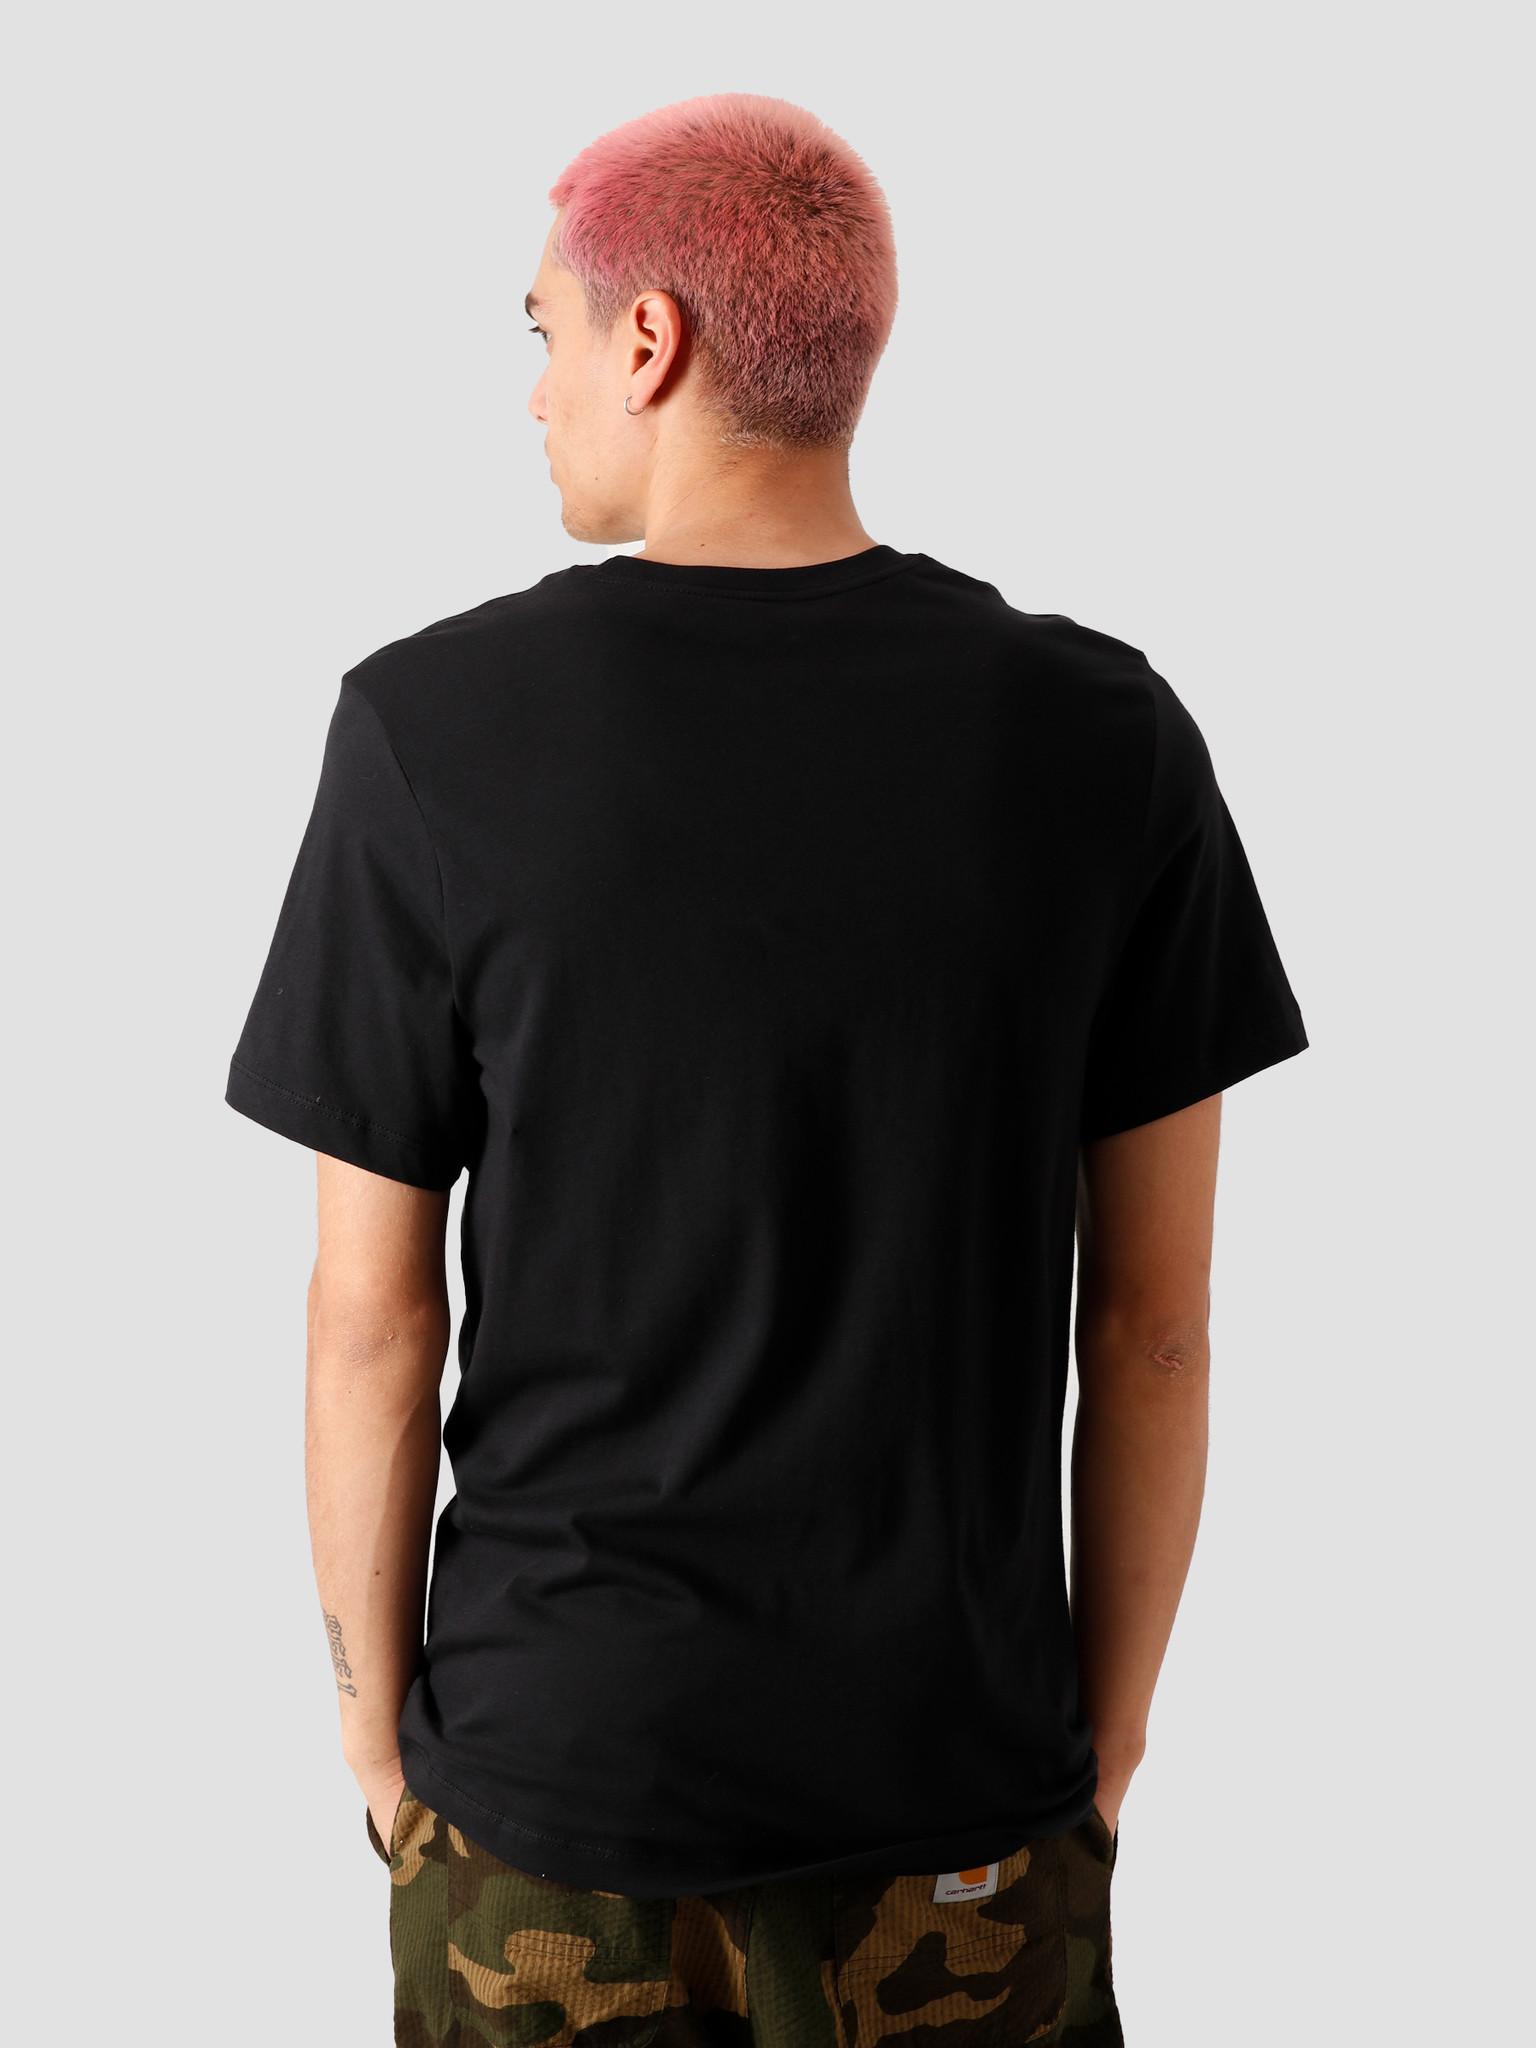 Nike Nike NSW Dna T-Shirt Black White CW2373-010